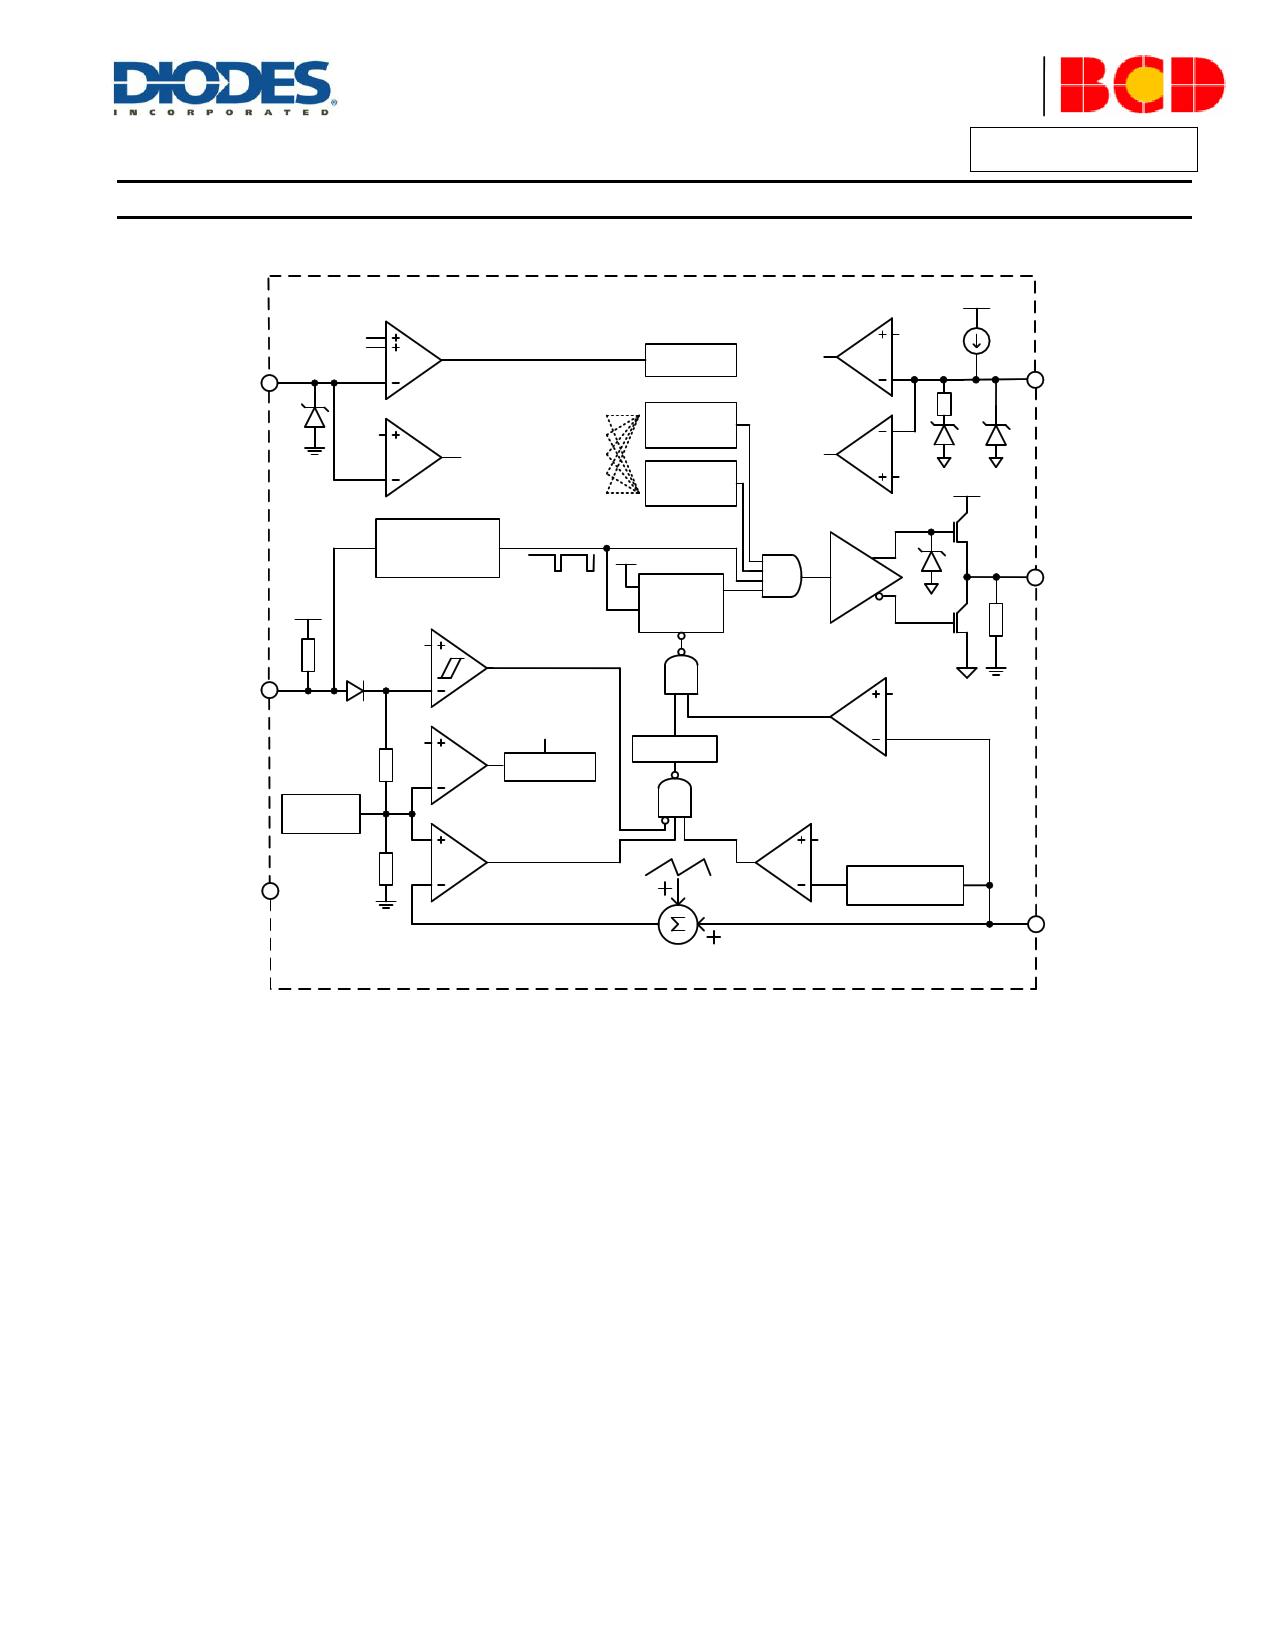 AP3105V pdf, 電子部品, 半導体, ピン配列